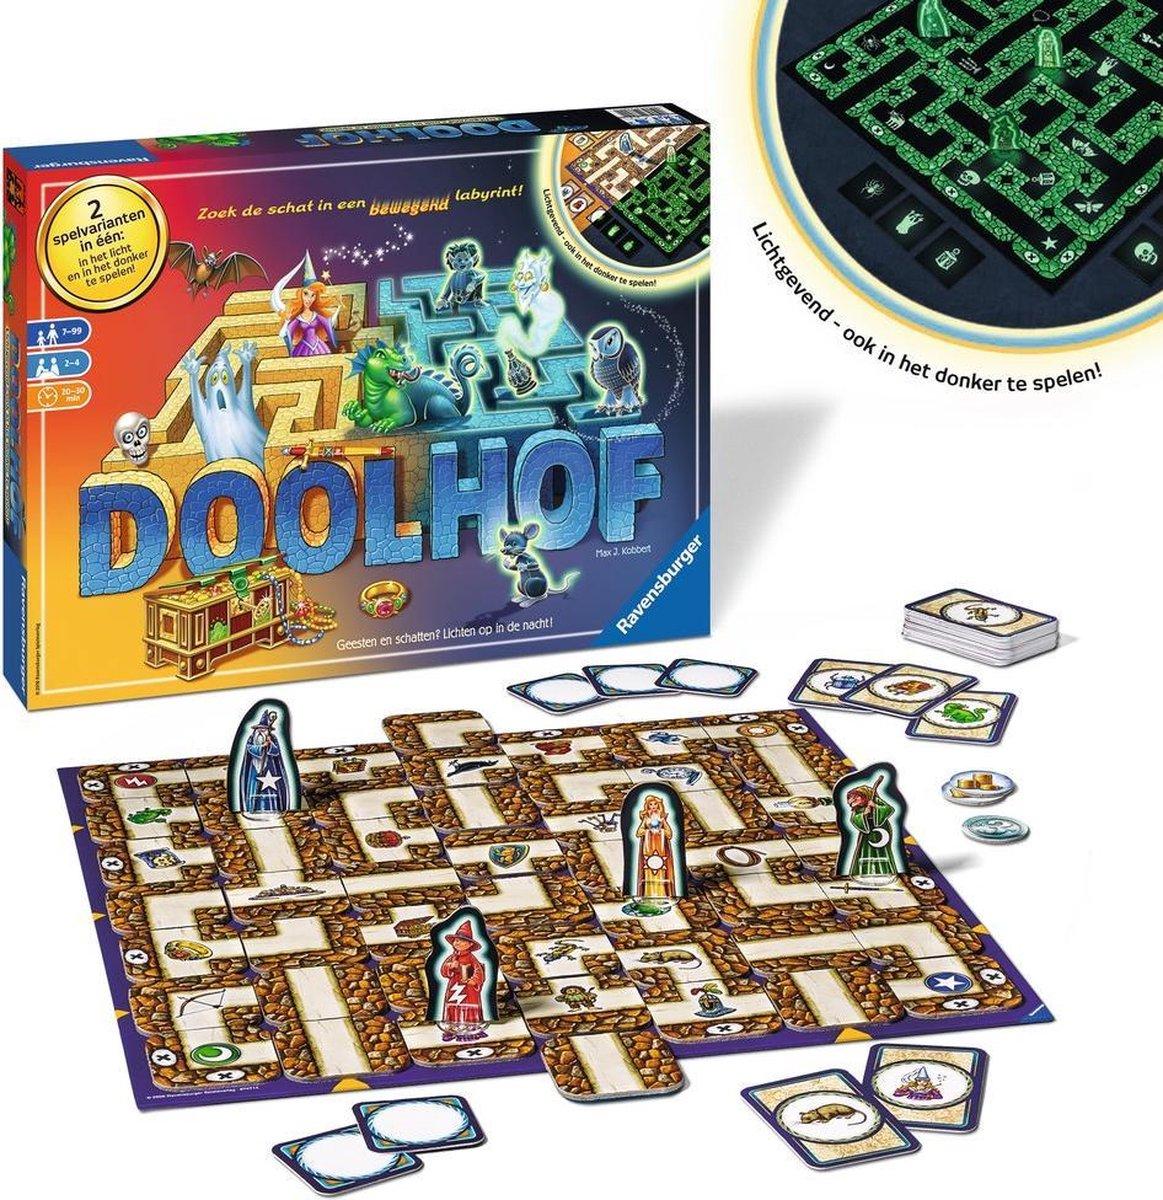 Ravensburger Betoverde Doolhof Glow In The Dark Bordspel Games Bol Com